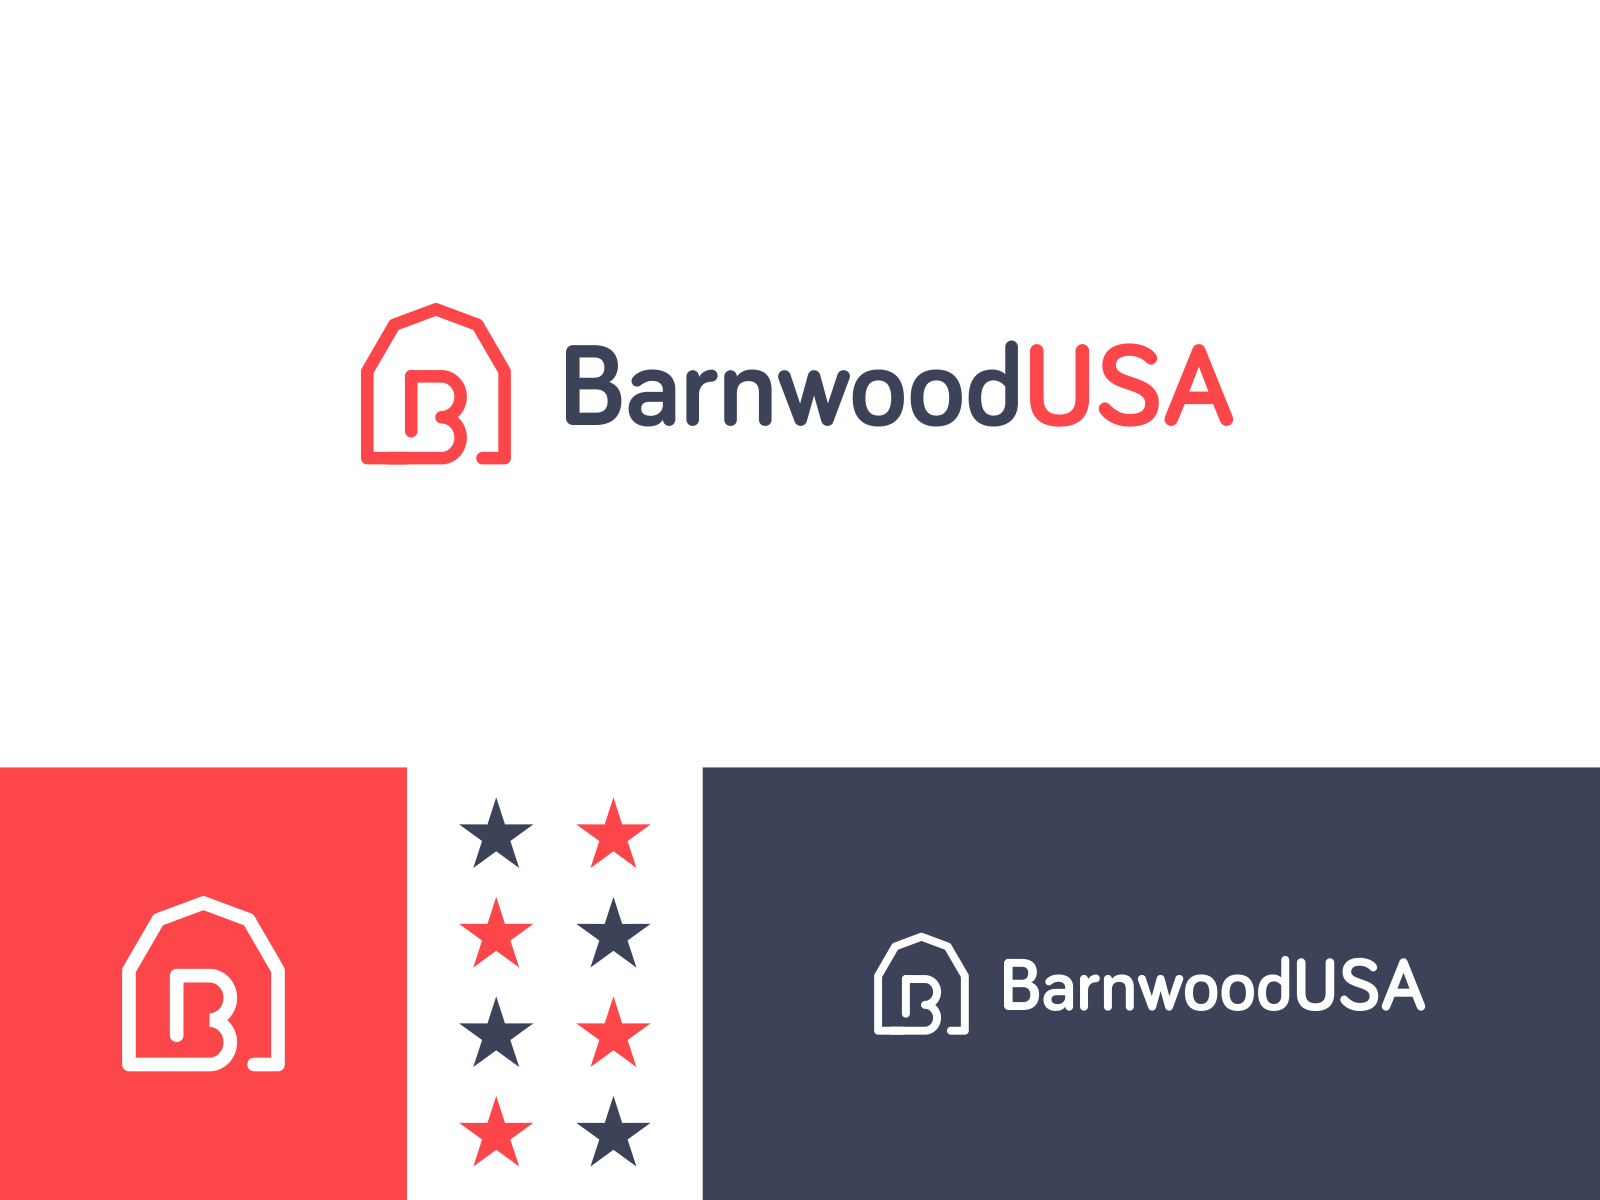 Barnwood USA Logo - Unused 2 rustic wood united states unused mark branding letter icon logo farm lettermark b blue white red patriotic america usa barnwood barn